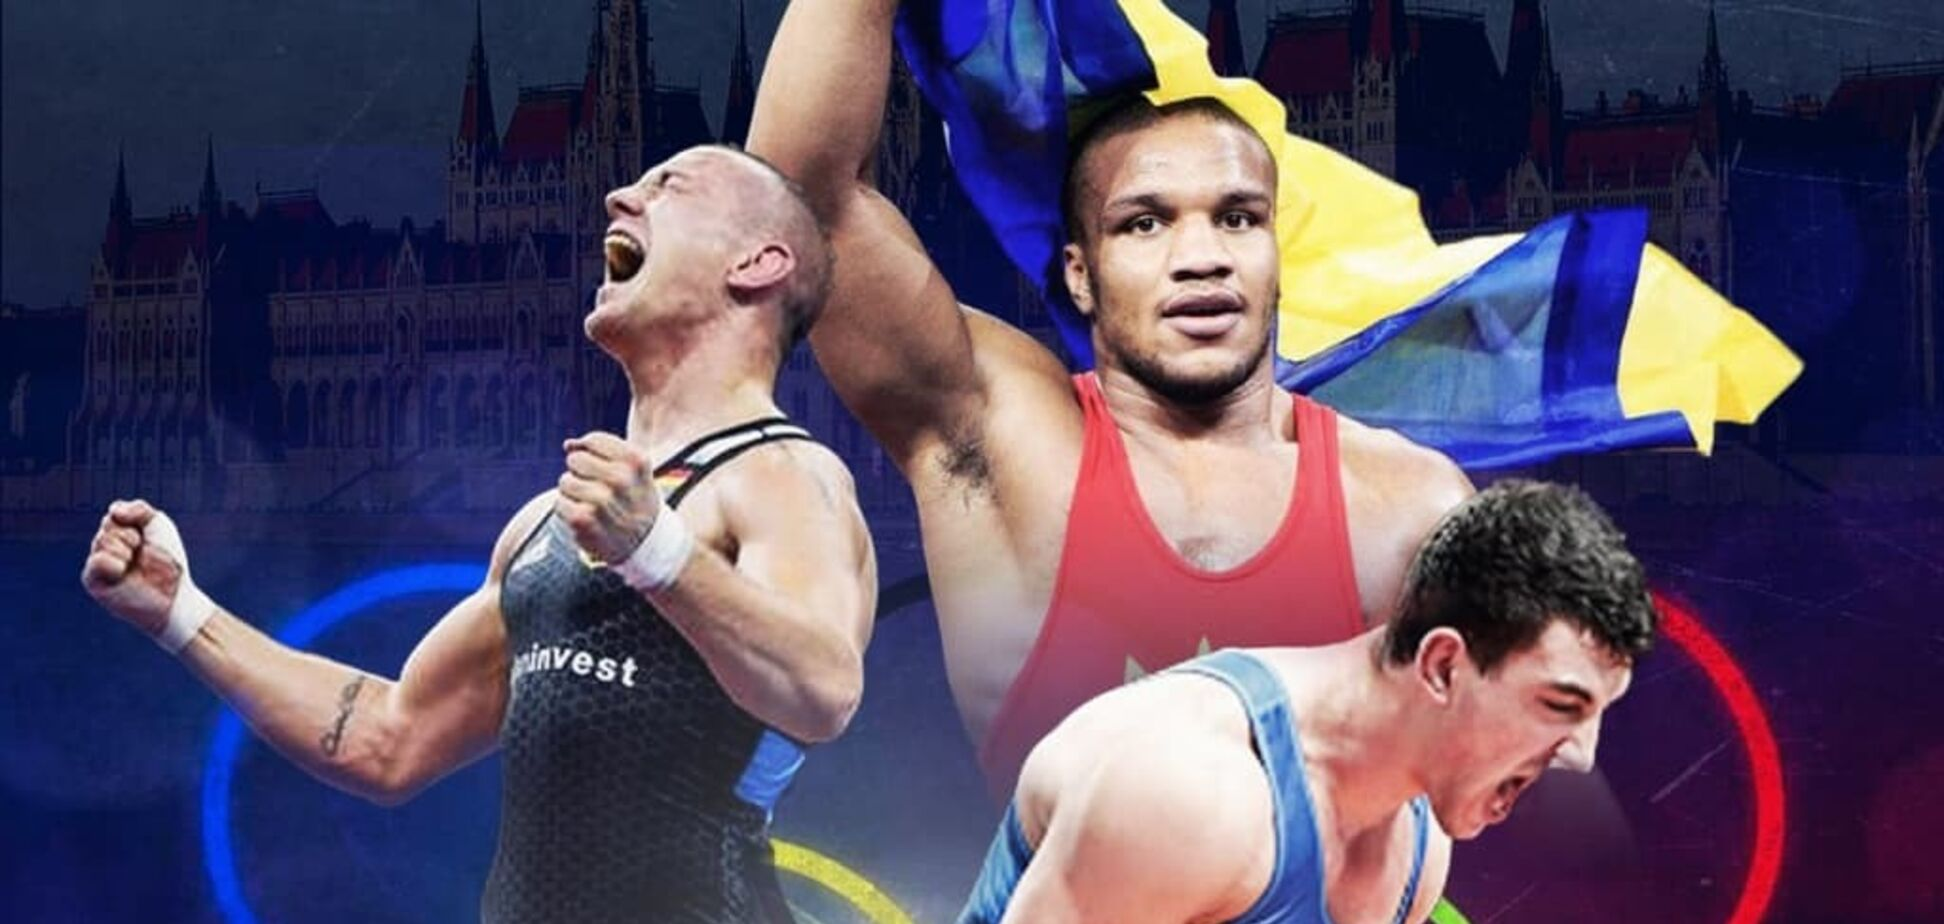 XSPORT покажет борцовскую квалификацию к Олимпиаде-2022